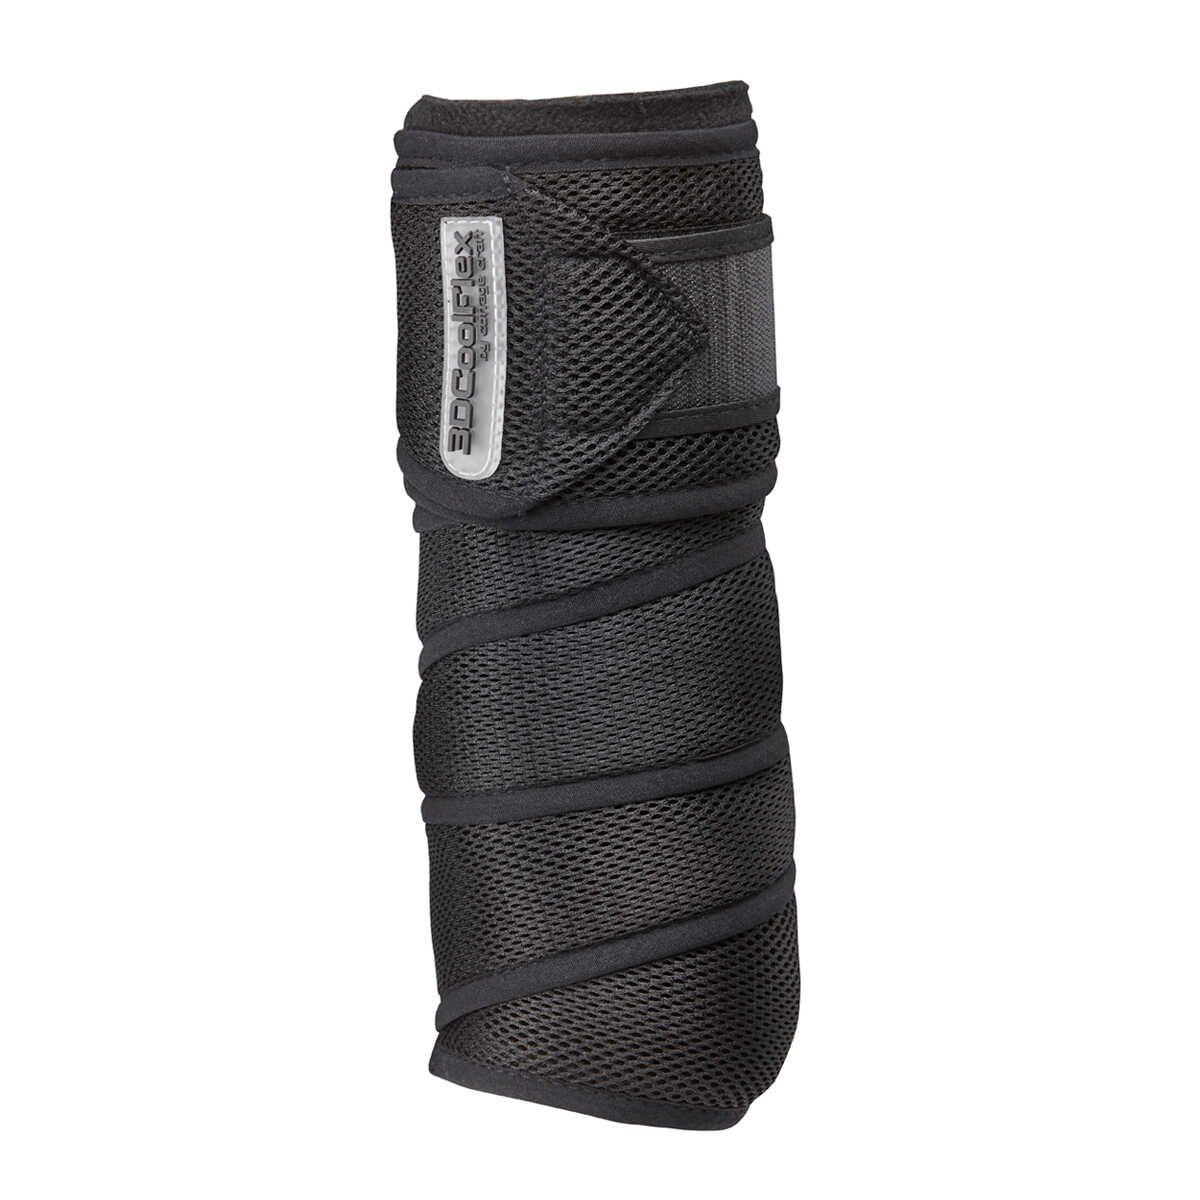 Cottage Craft 3D CoolFlex Exercise Bandages